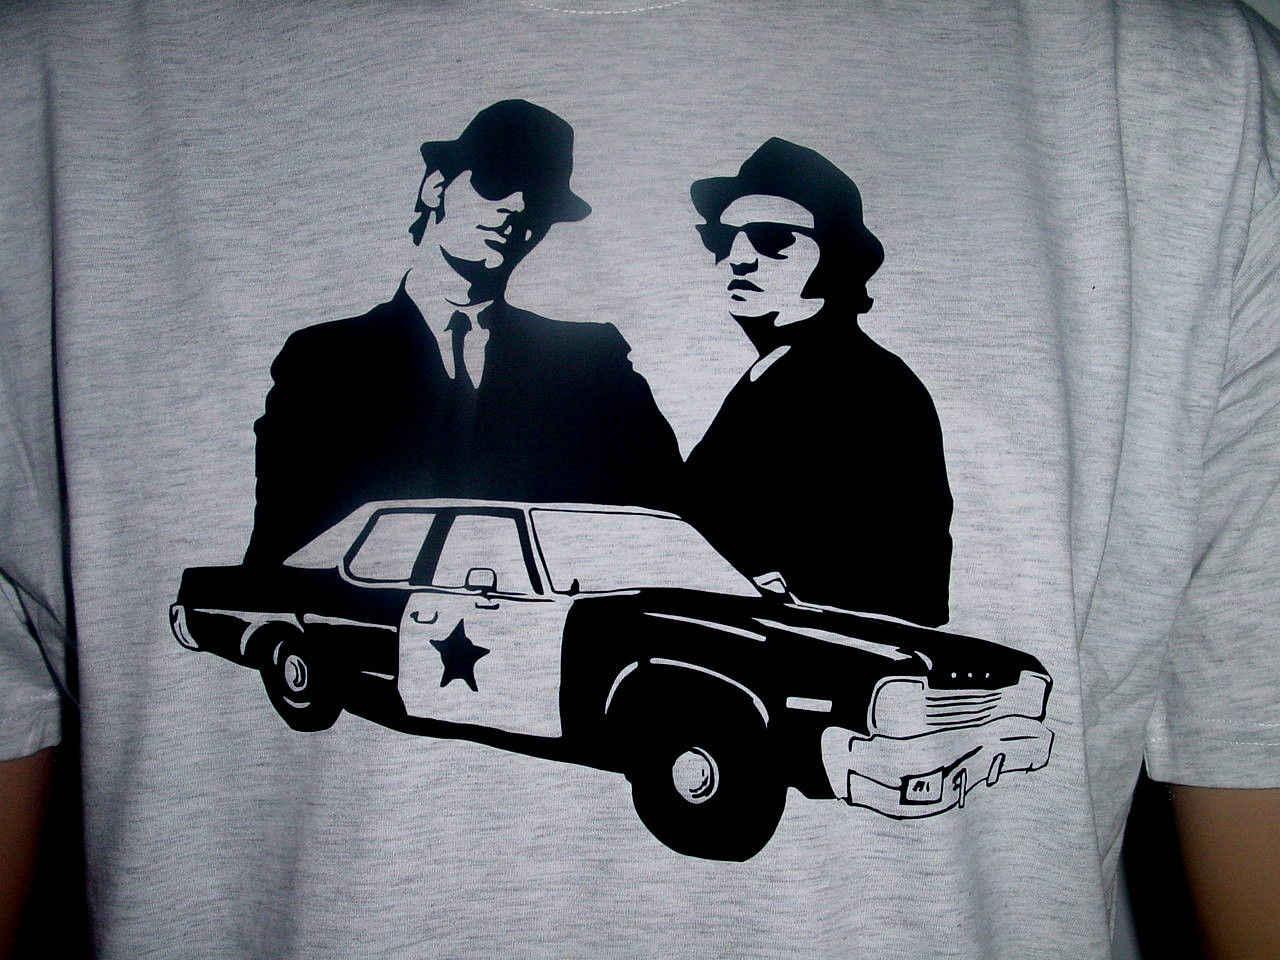 Blues Brothers Bluesmobil футболка ASHGRAU Groe L NEU - 11.11_Double 11_Singles